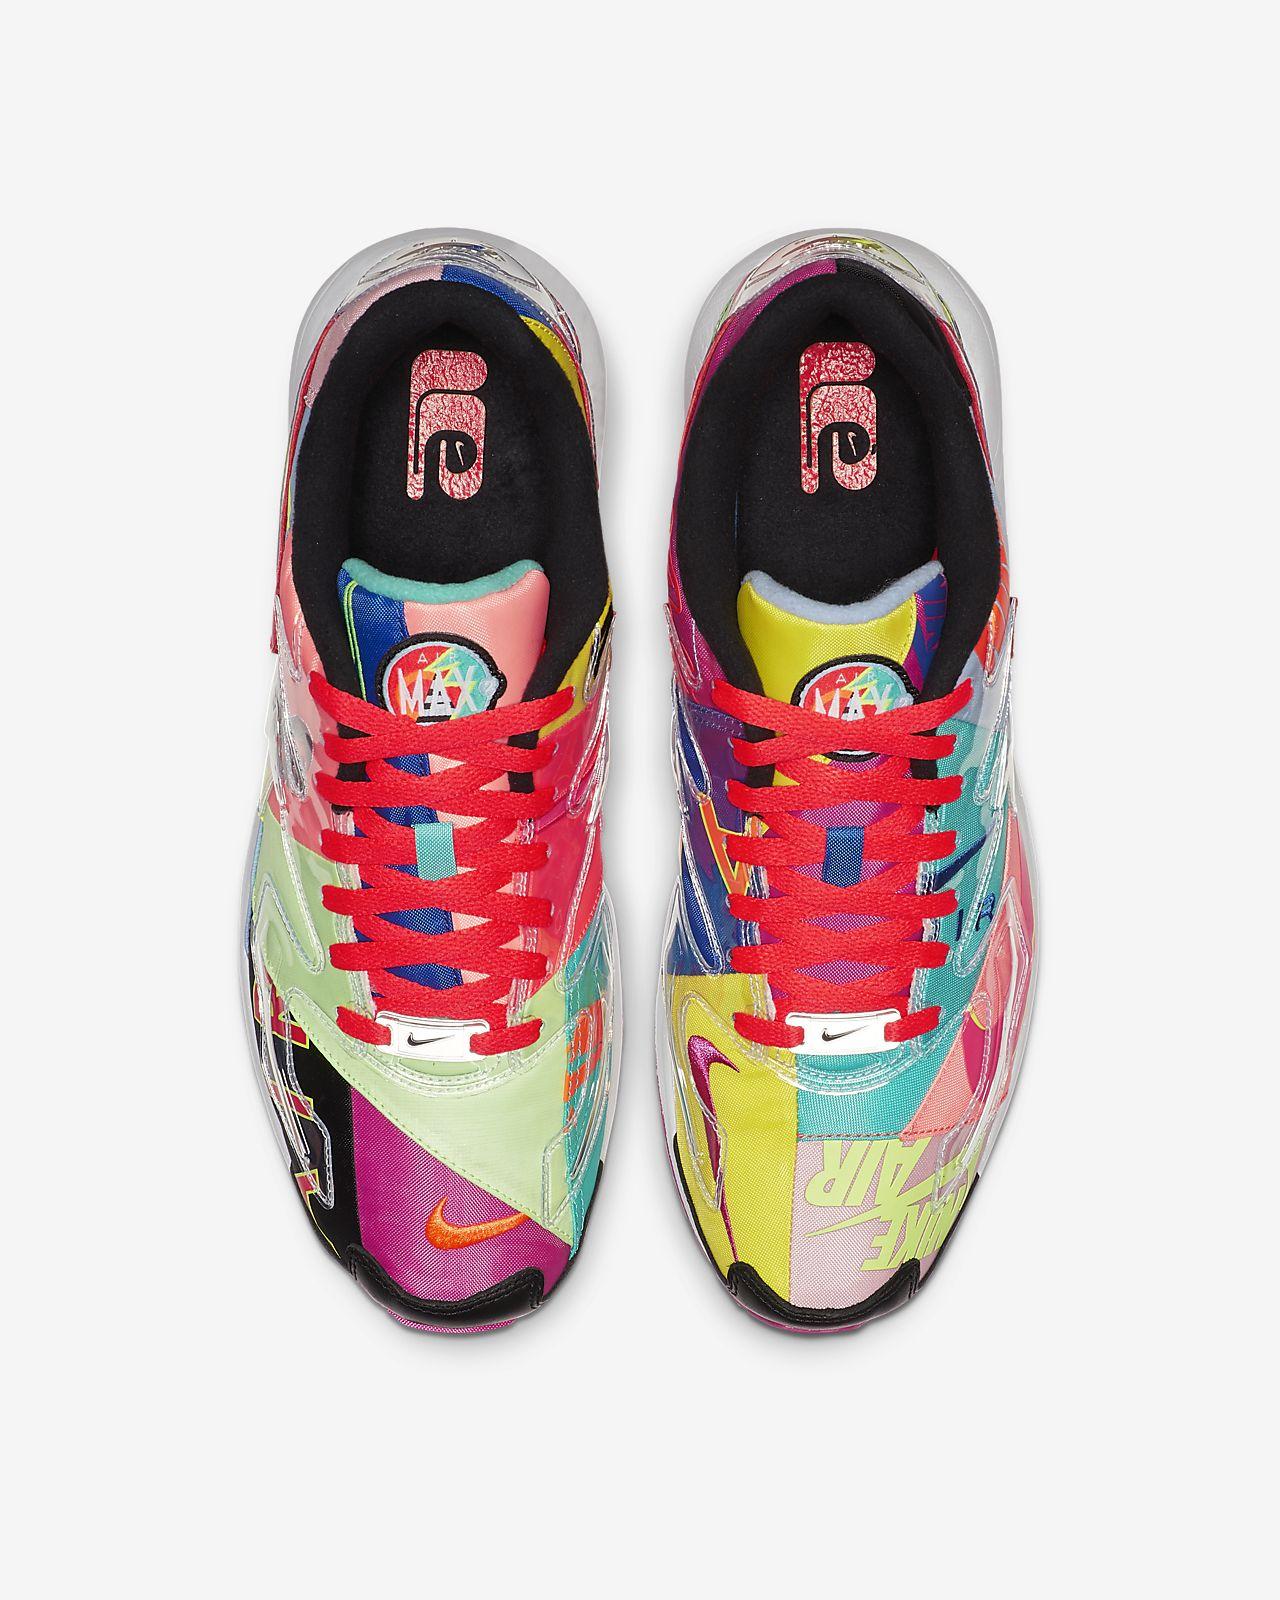 promo code 9dfe3 e8d8d ... Nike Air Max2 Light QS Men s Shoe